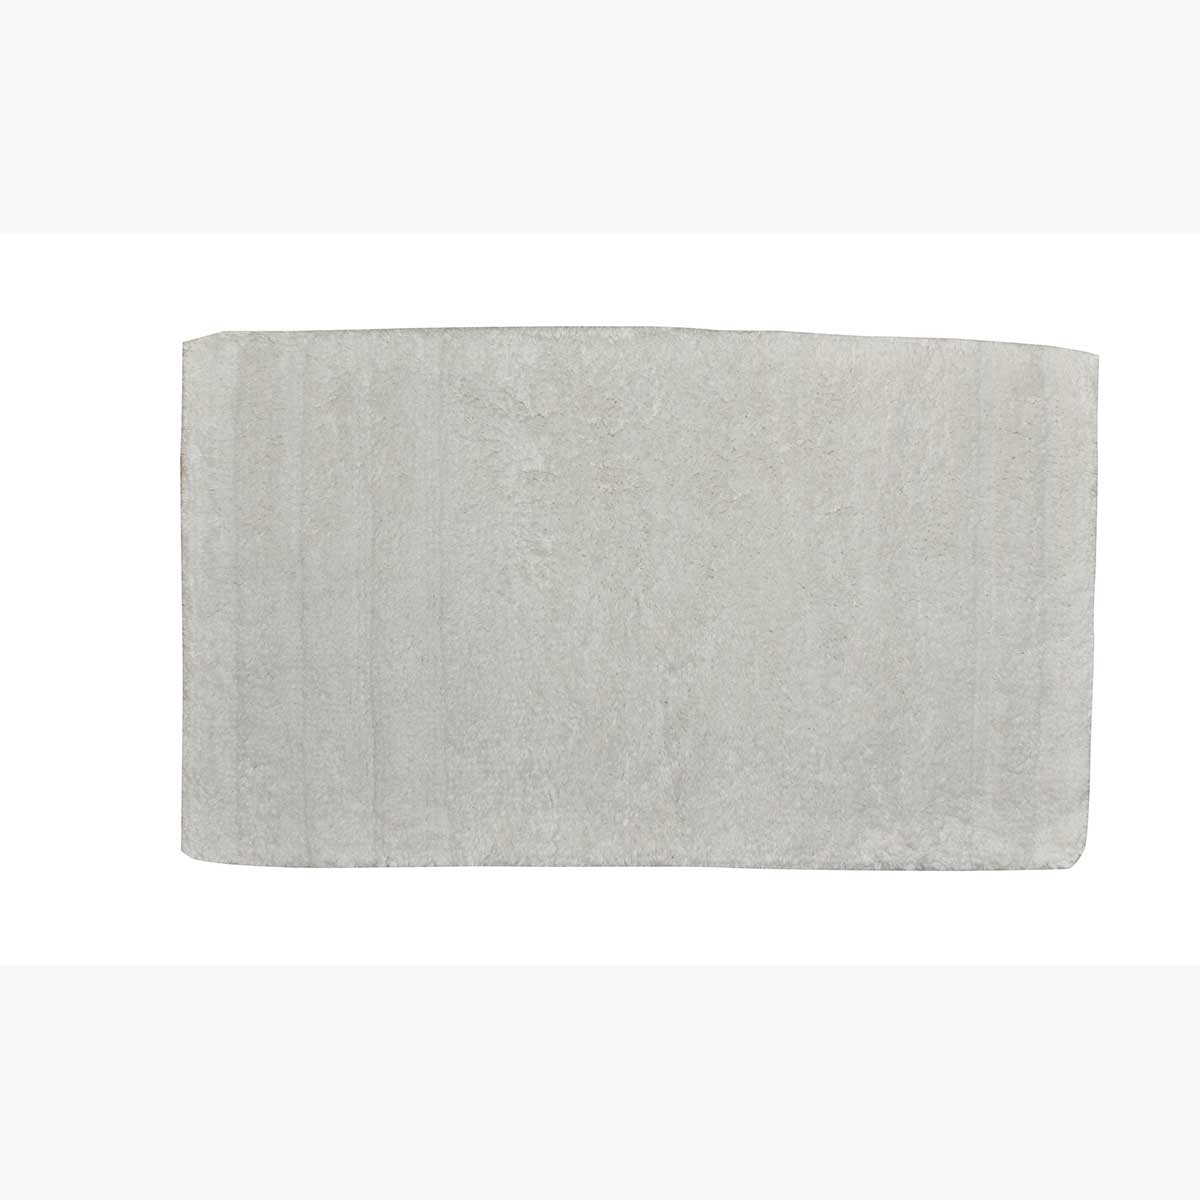 Tapis de bain uni en coton (Blanc)